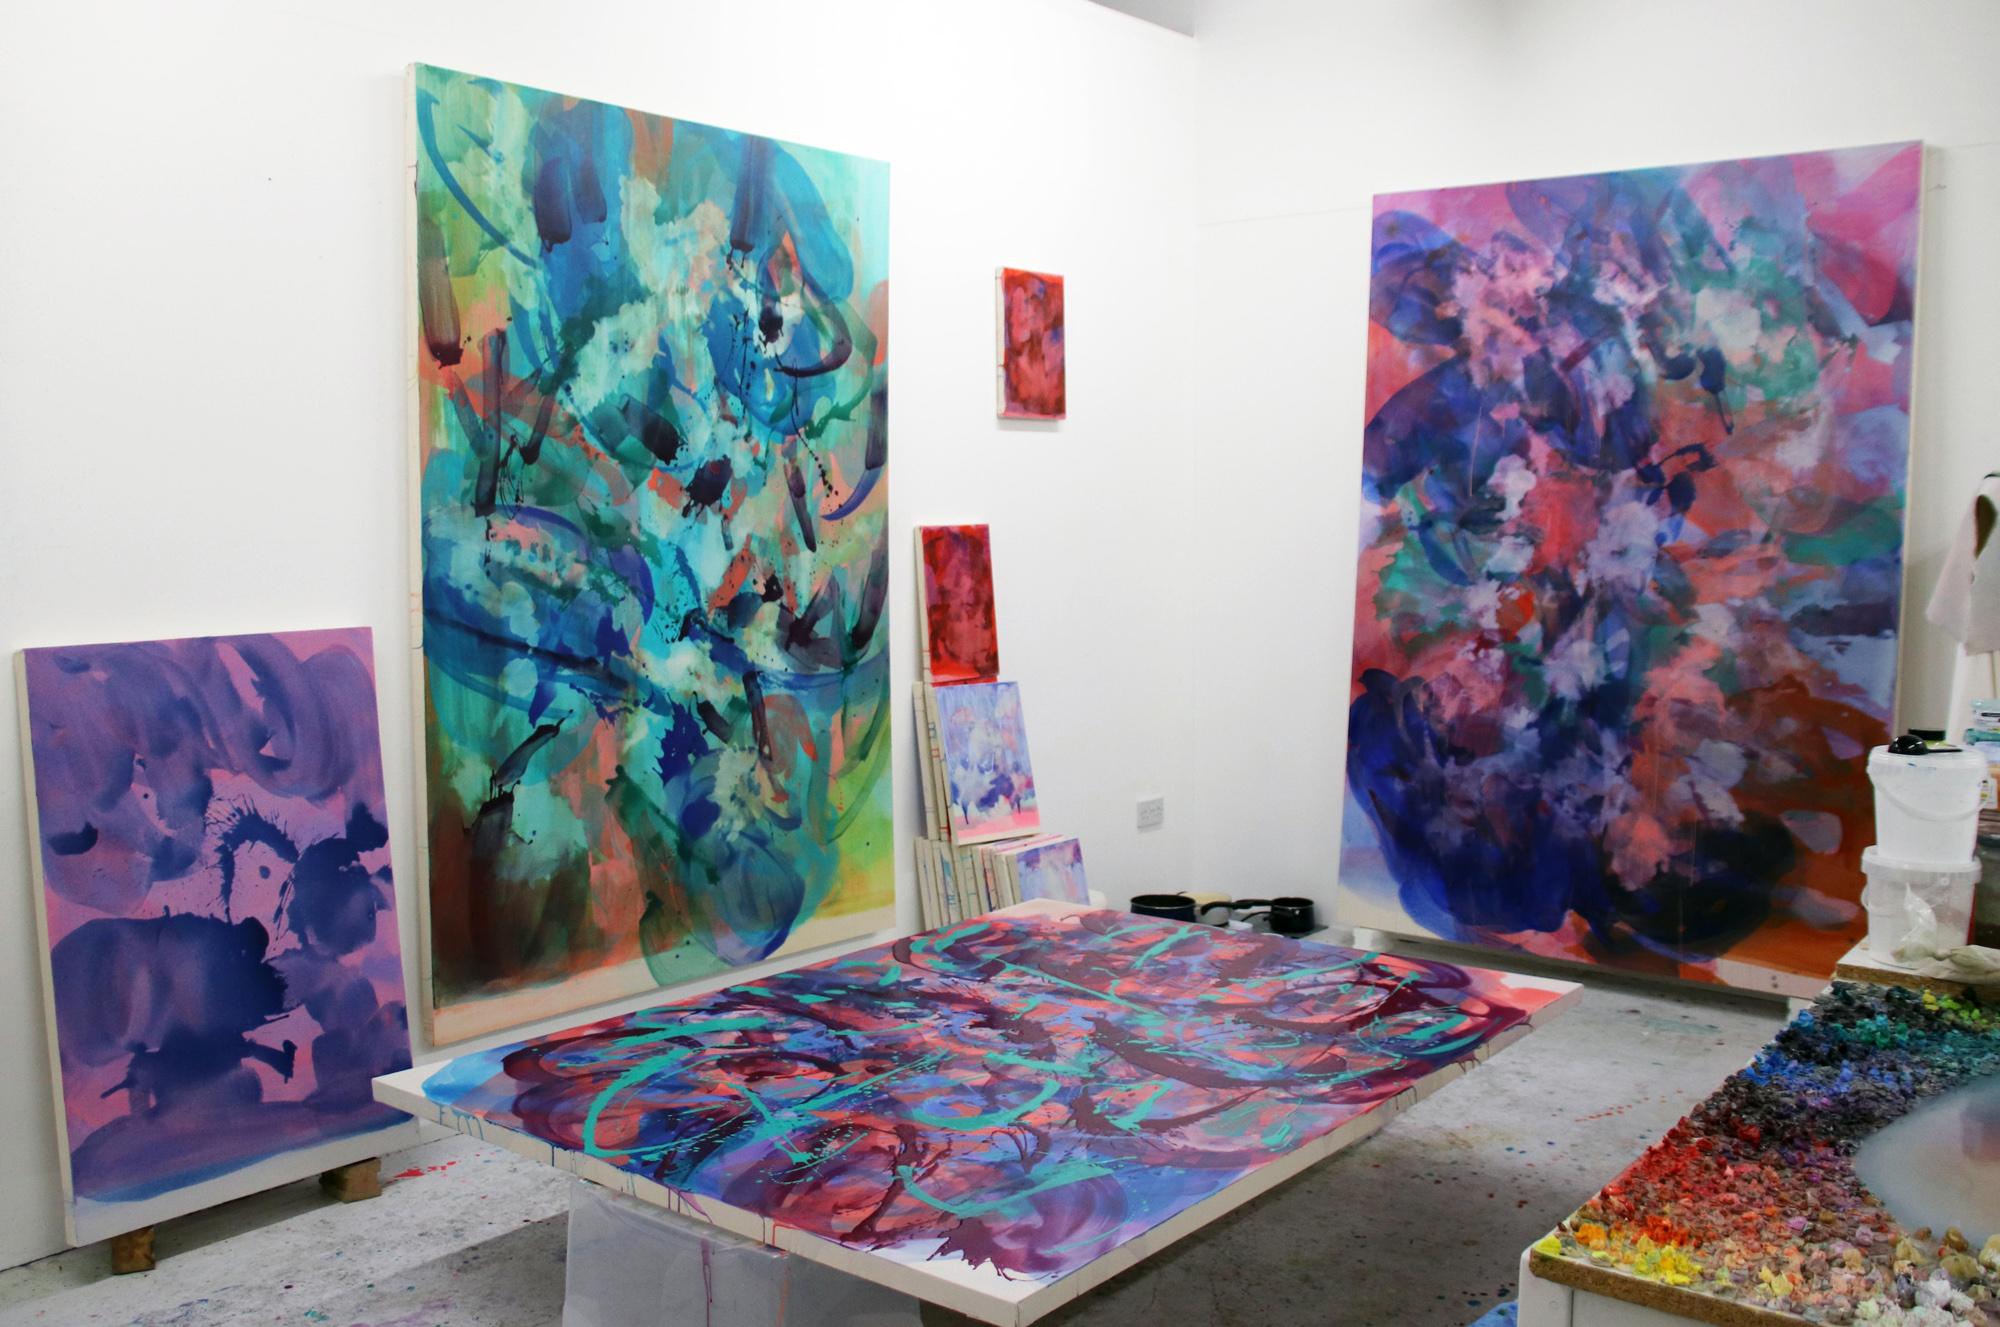 Distemper paintings  Studio shot  work in progress  2019